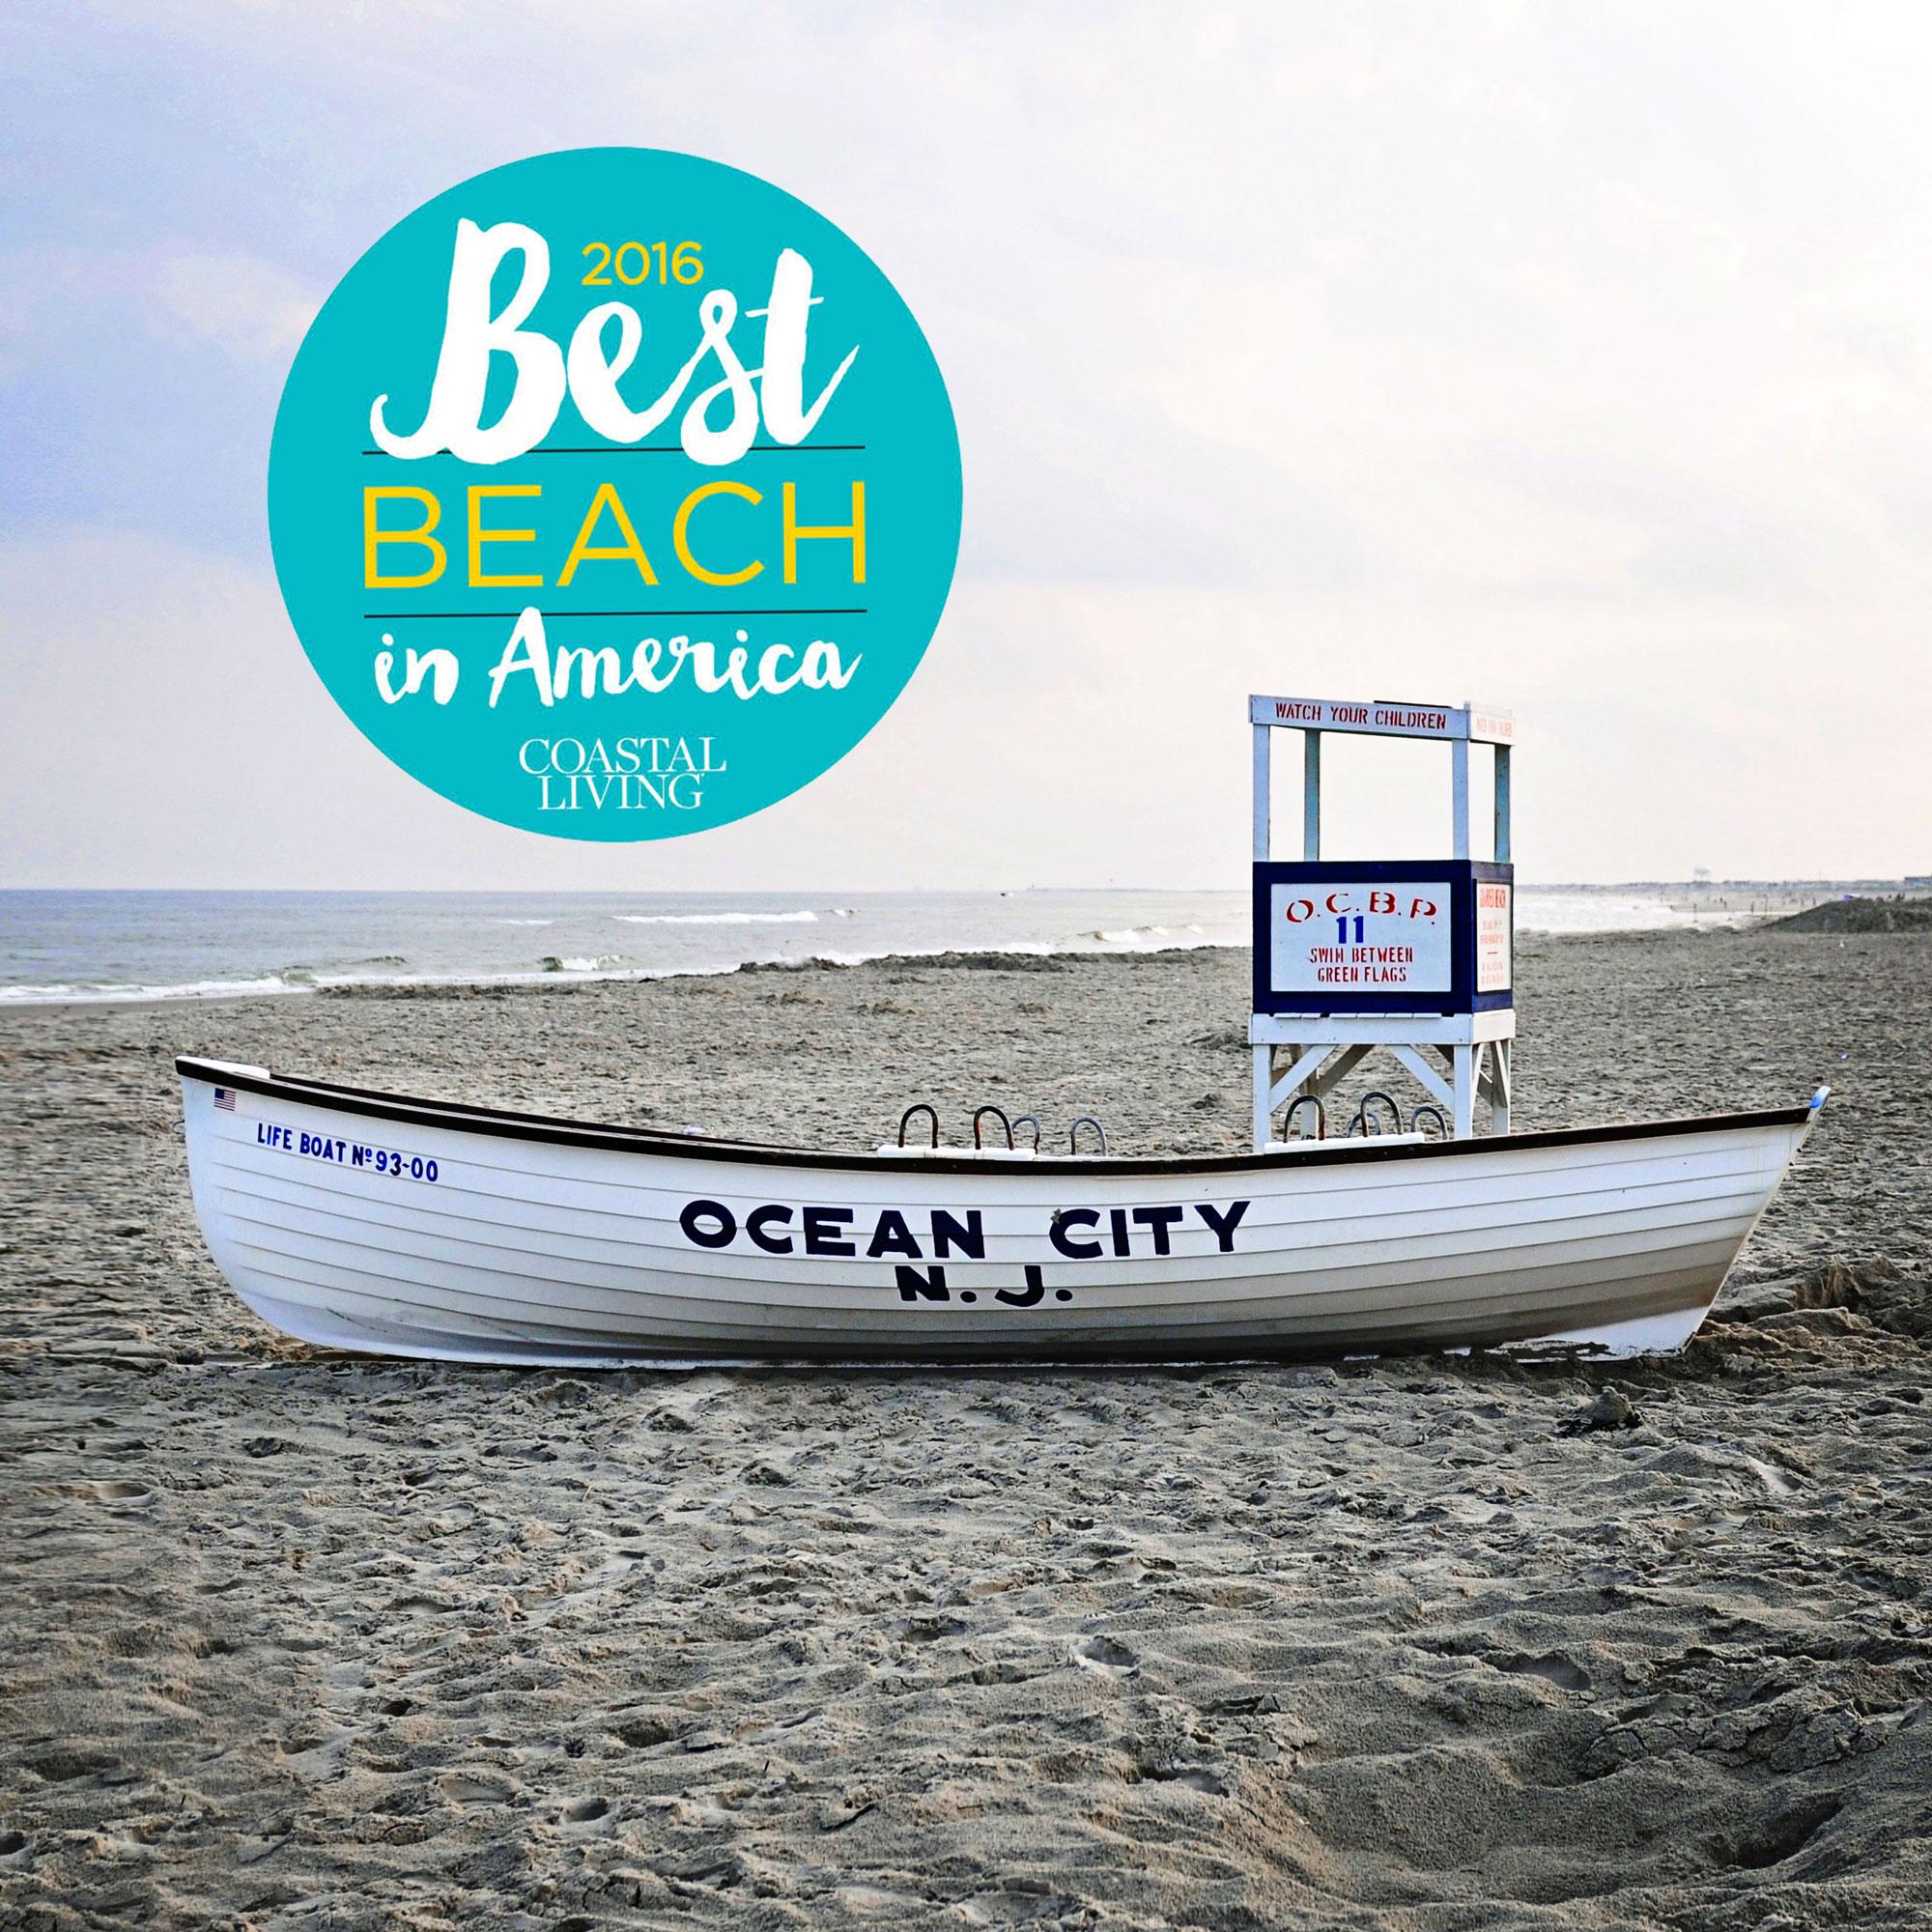 Ocean City Nj Named The Best Beach In